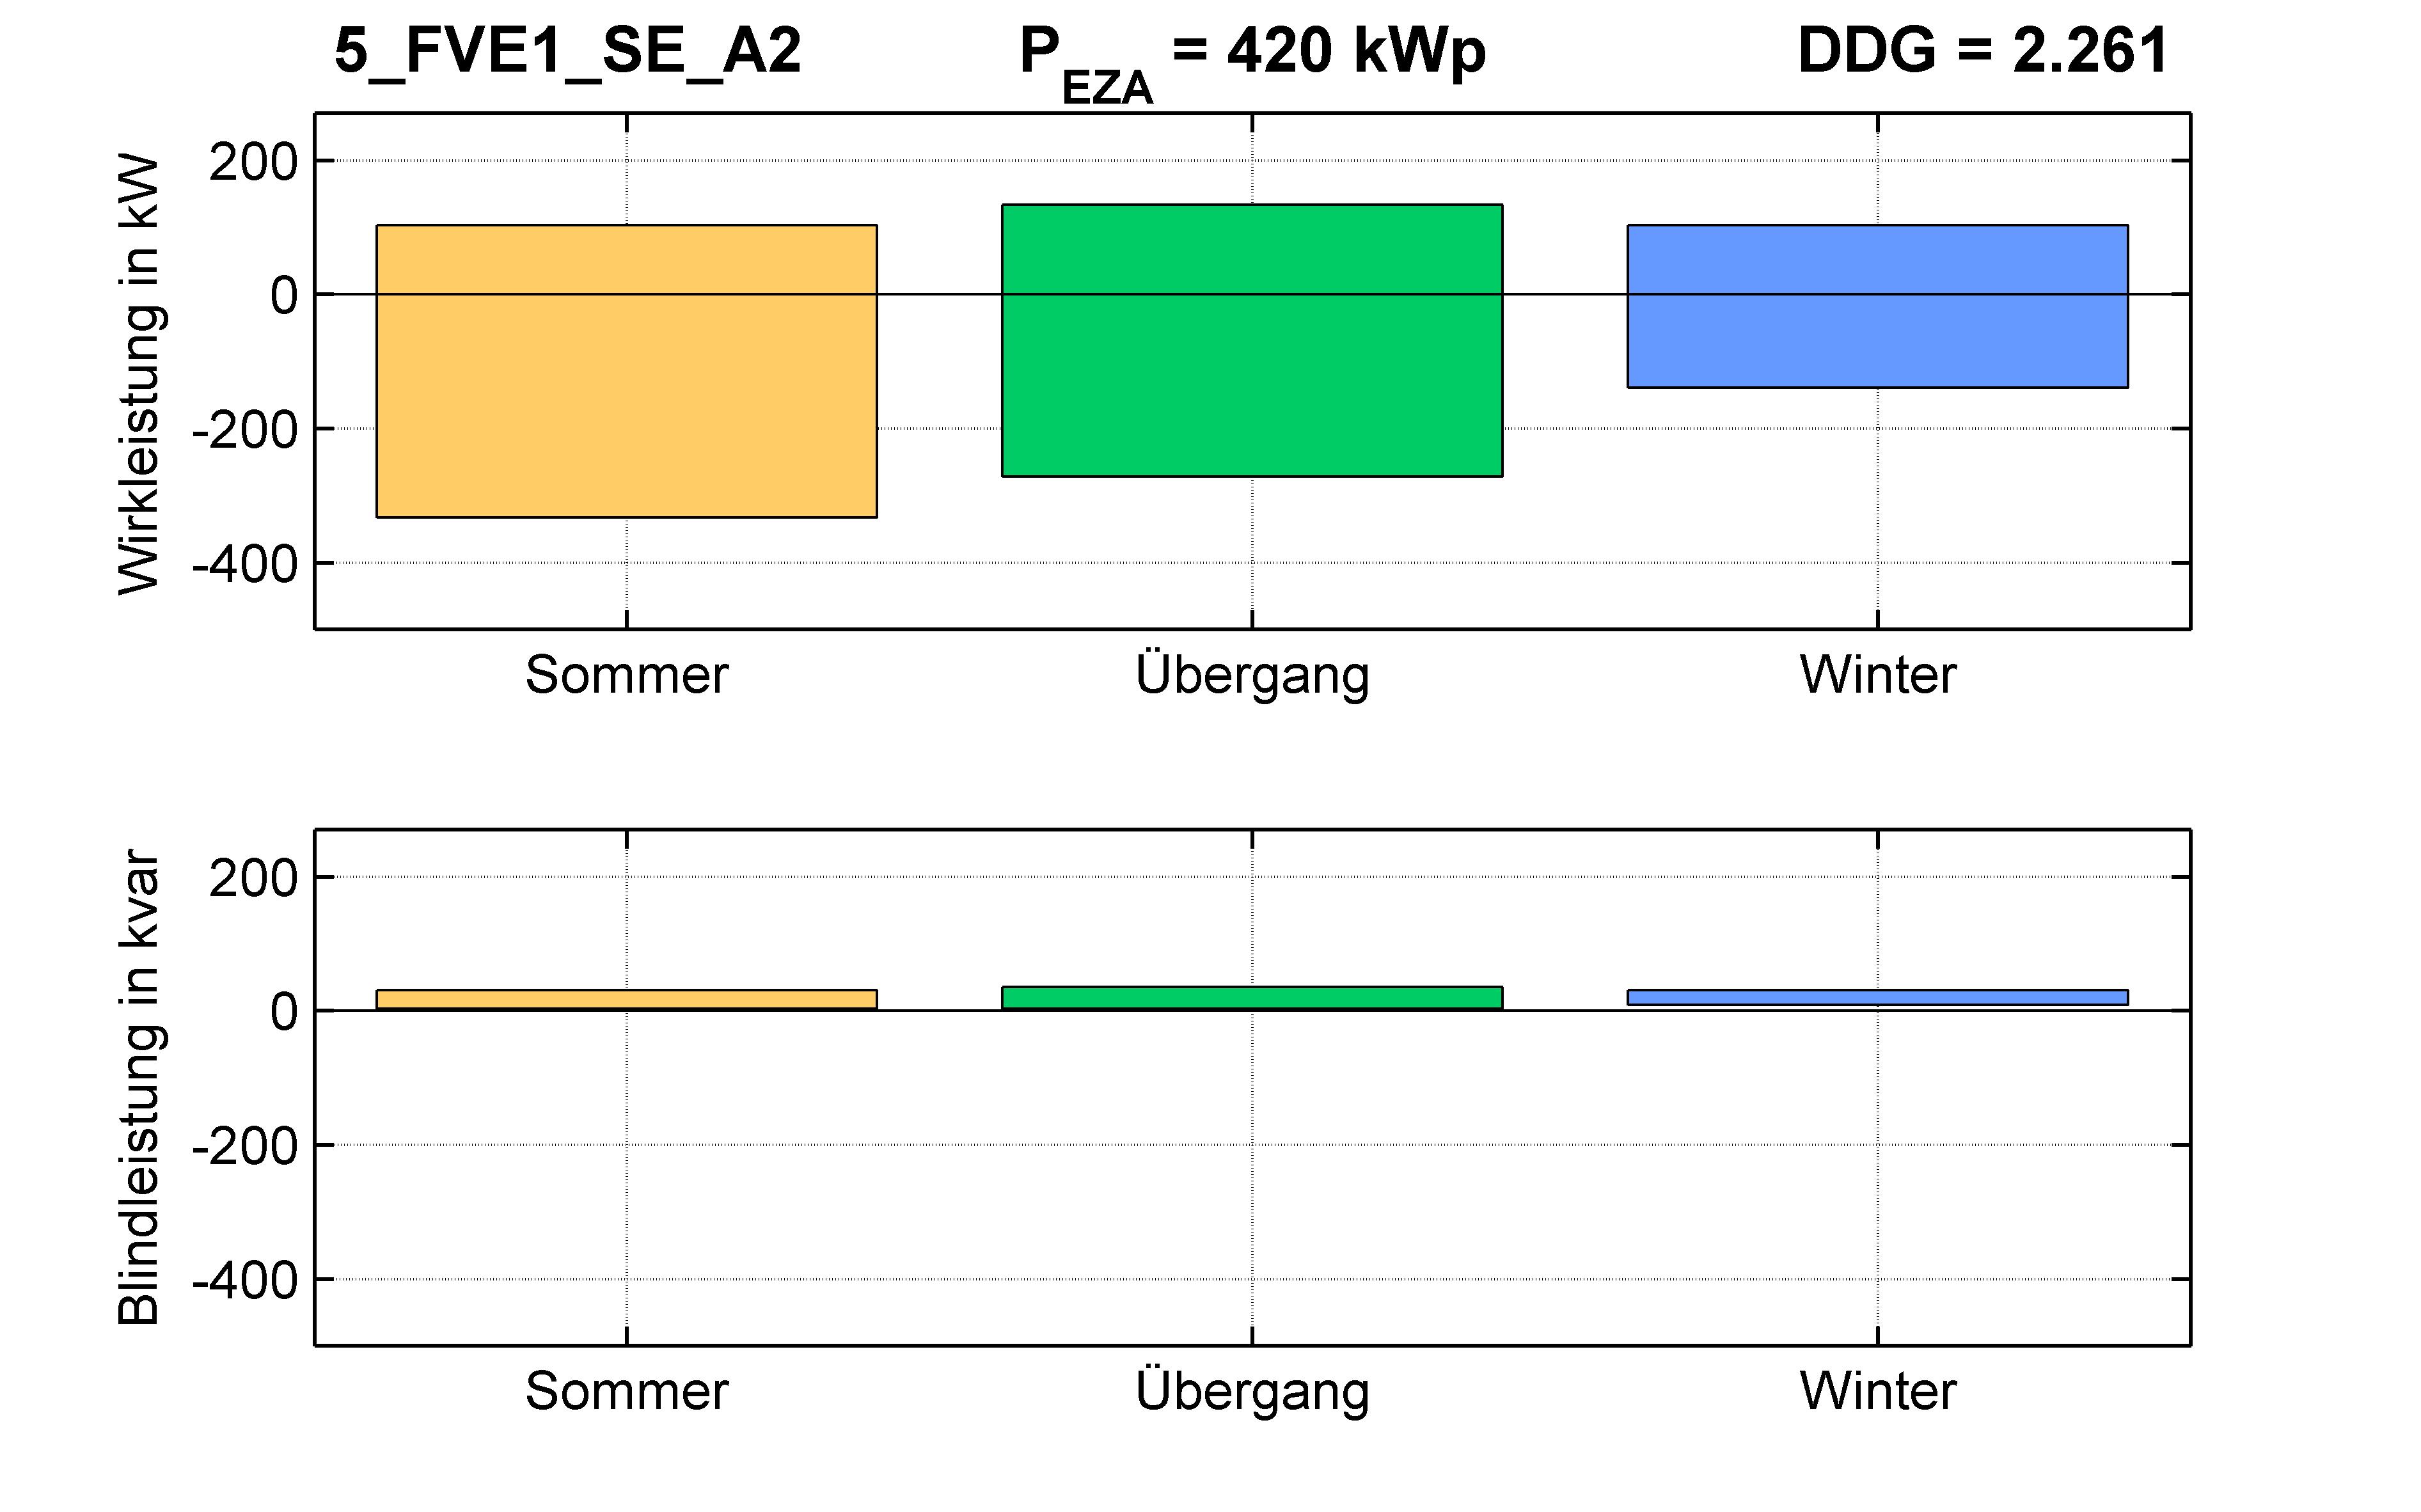 FVE1 | STATION (SE) A2 | PQ-Bilanz